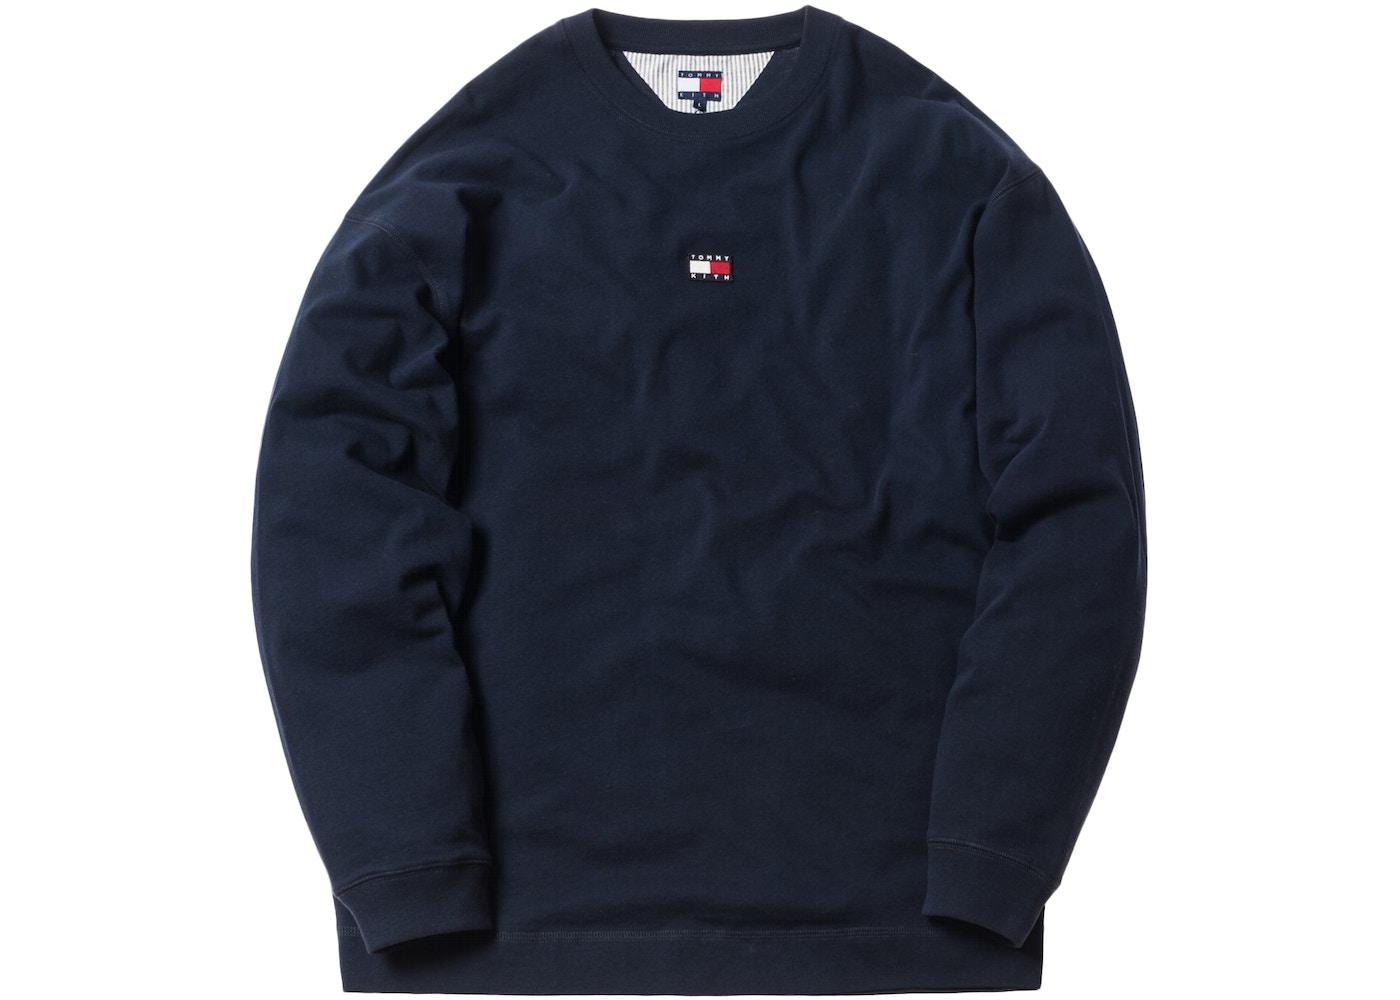 39bb41d4d3 Buy   Sell Kith Streetwear - Release Date